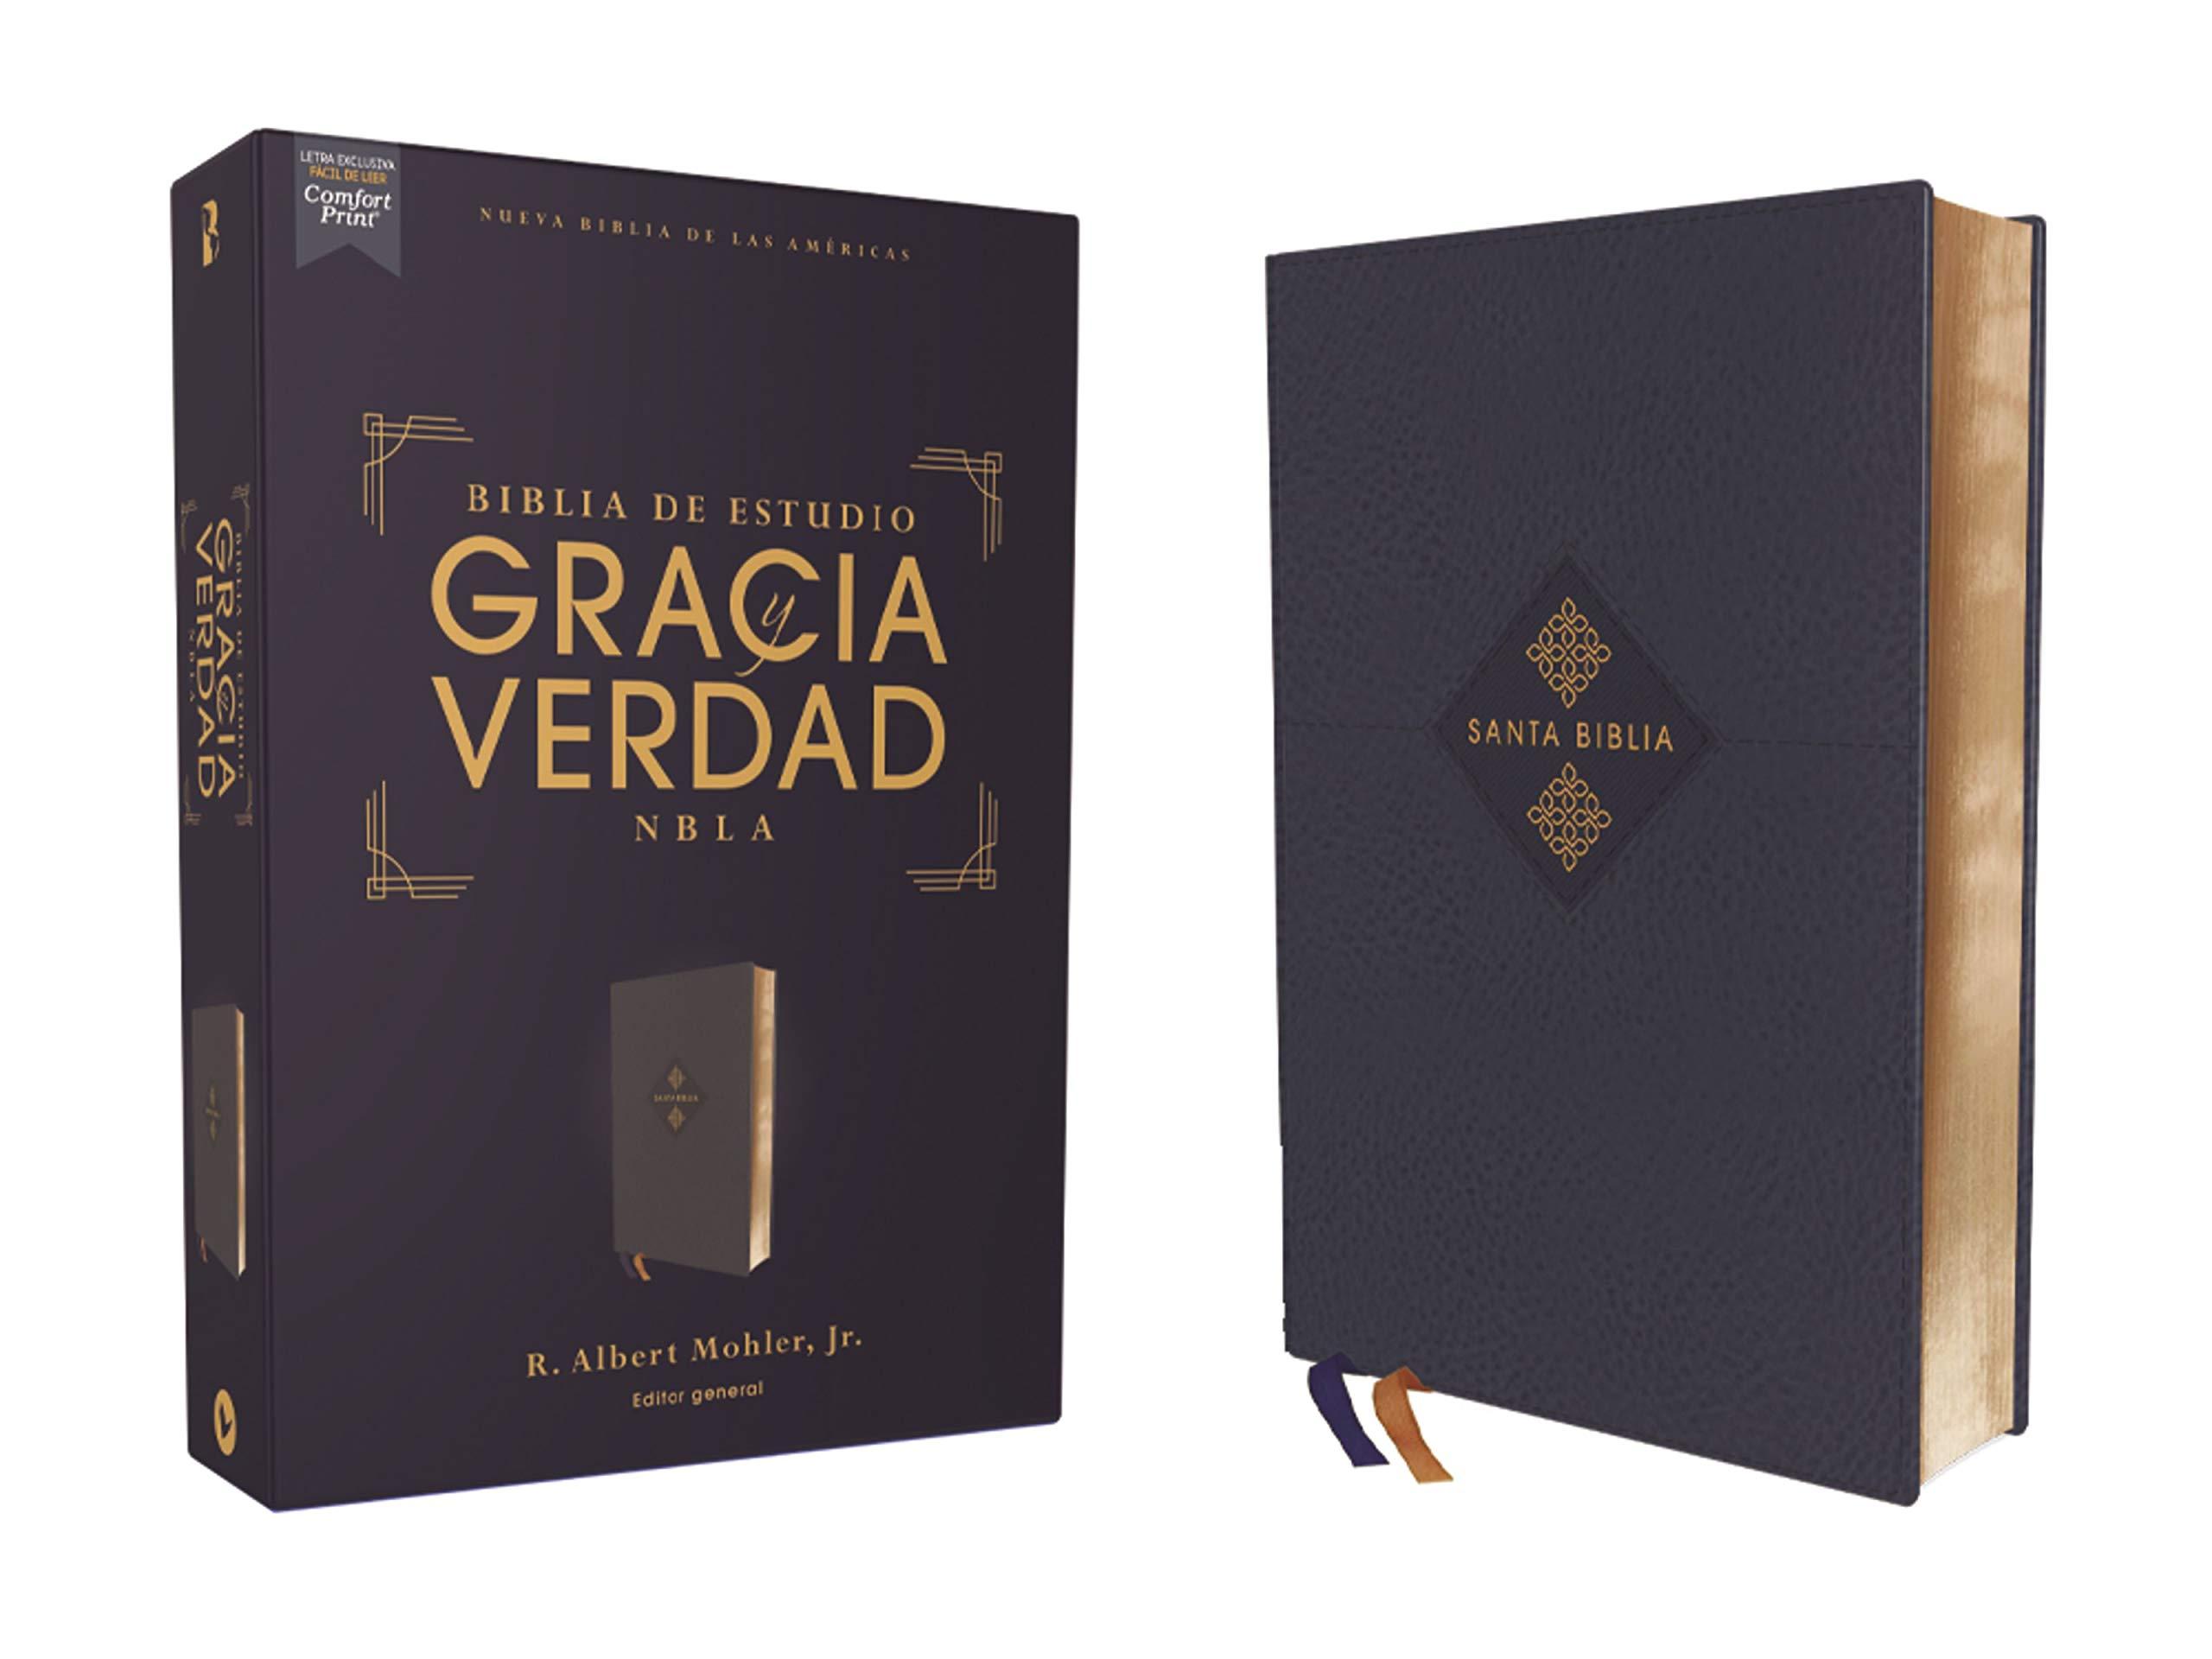 Biblia NBLA Estudio Gracia Verdad Leathersoft Azul Marino